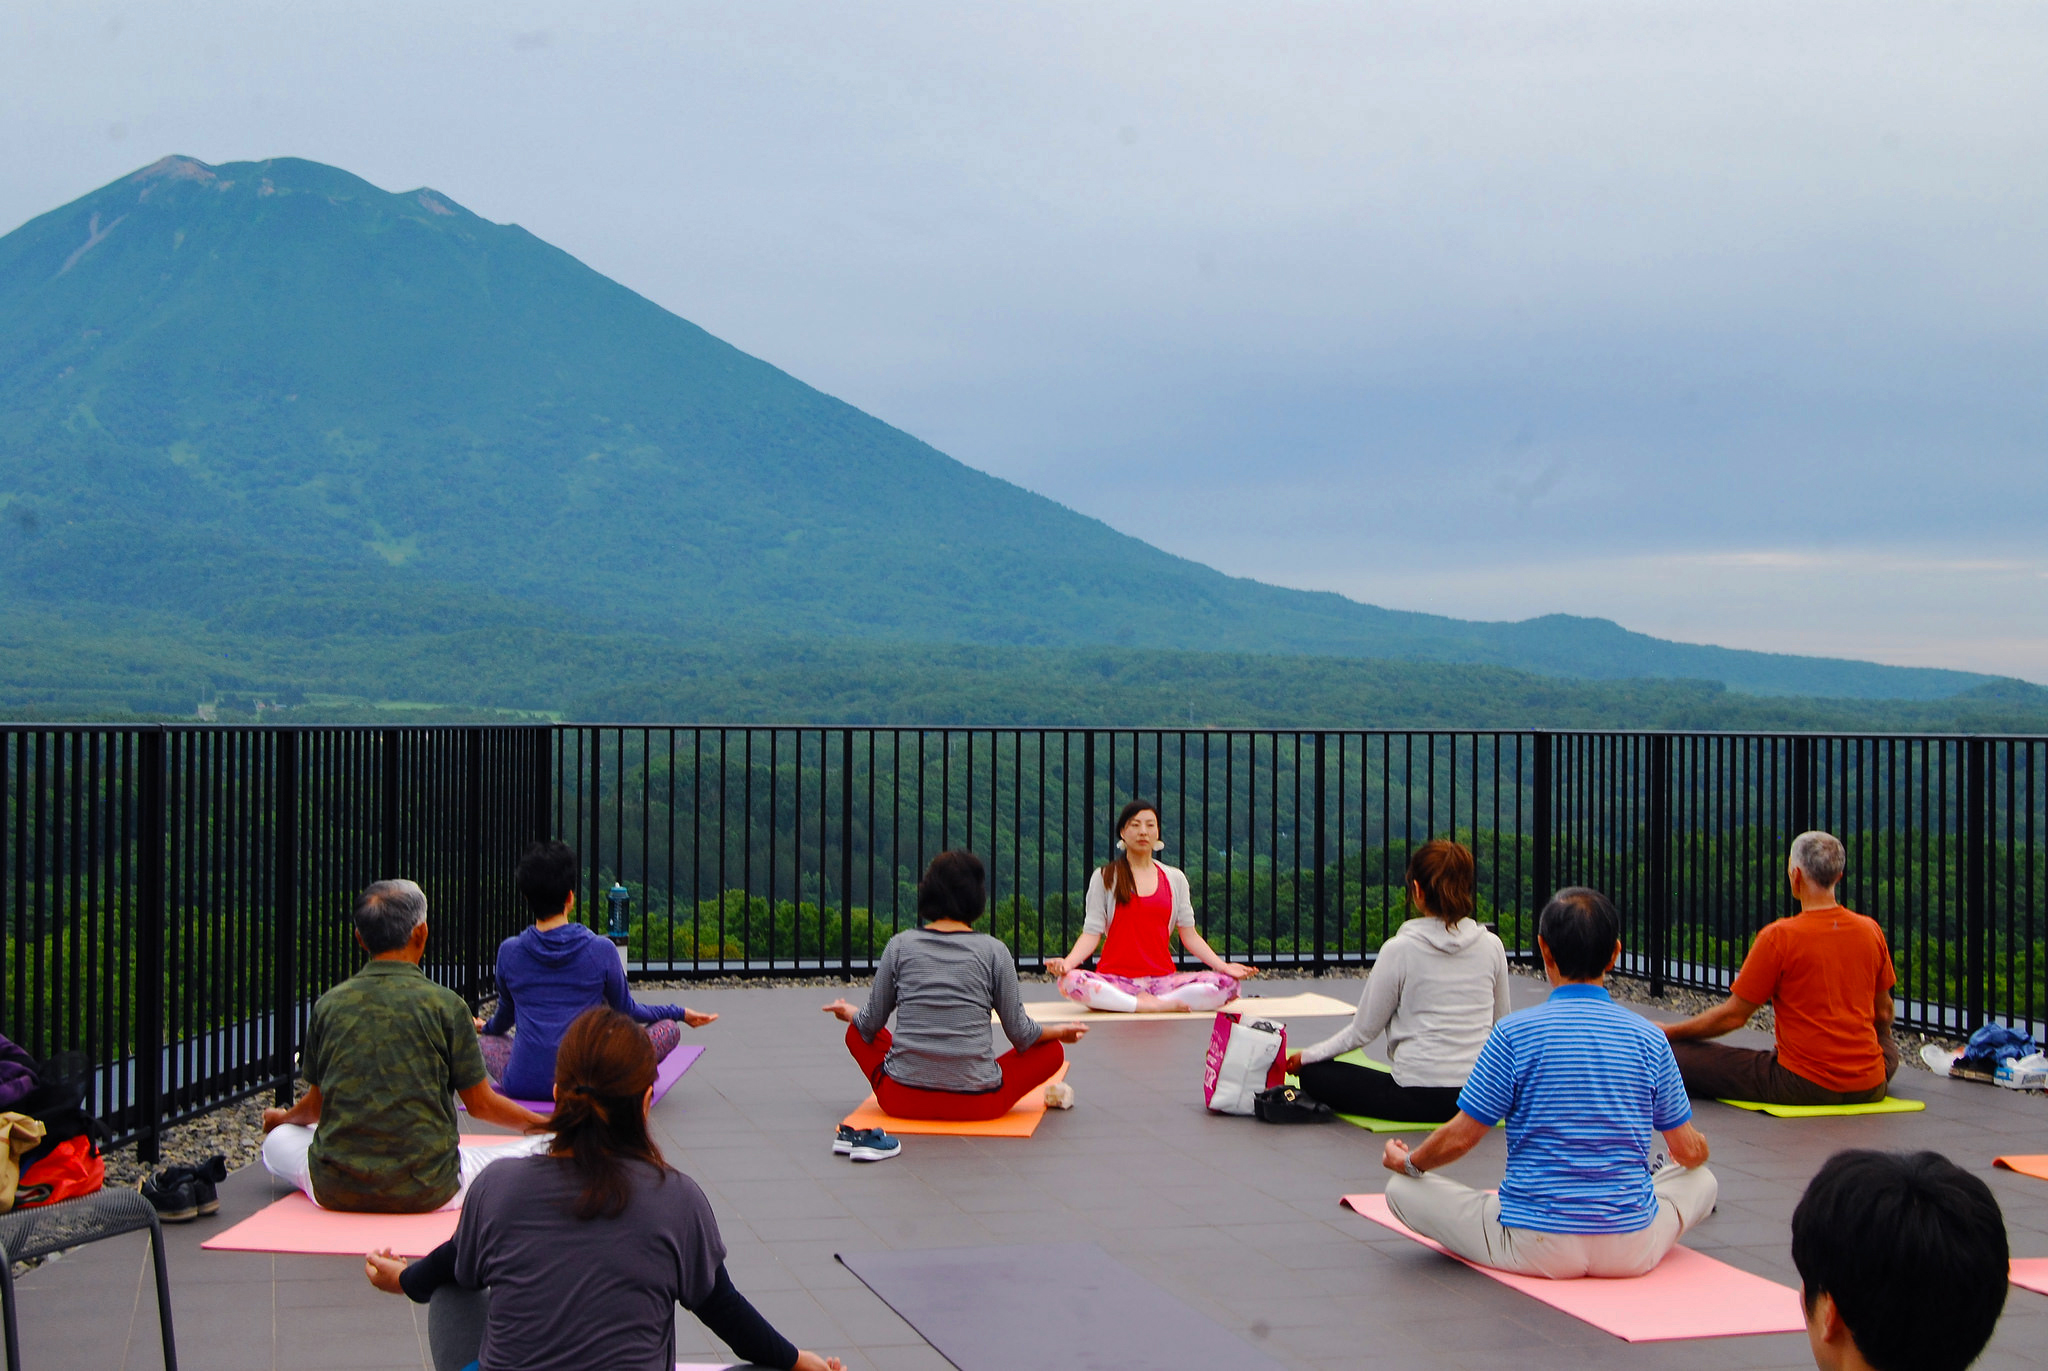 Sunset yoga session at Aspect Niseko